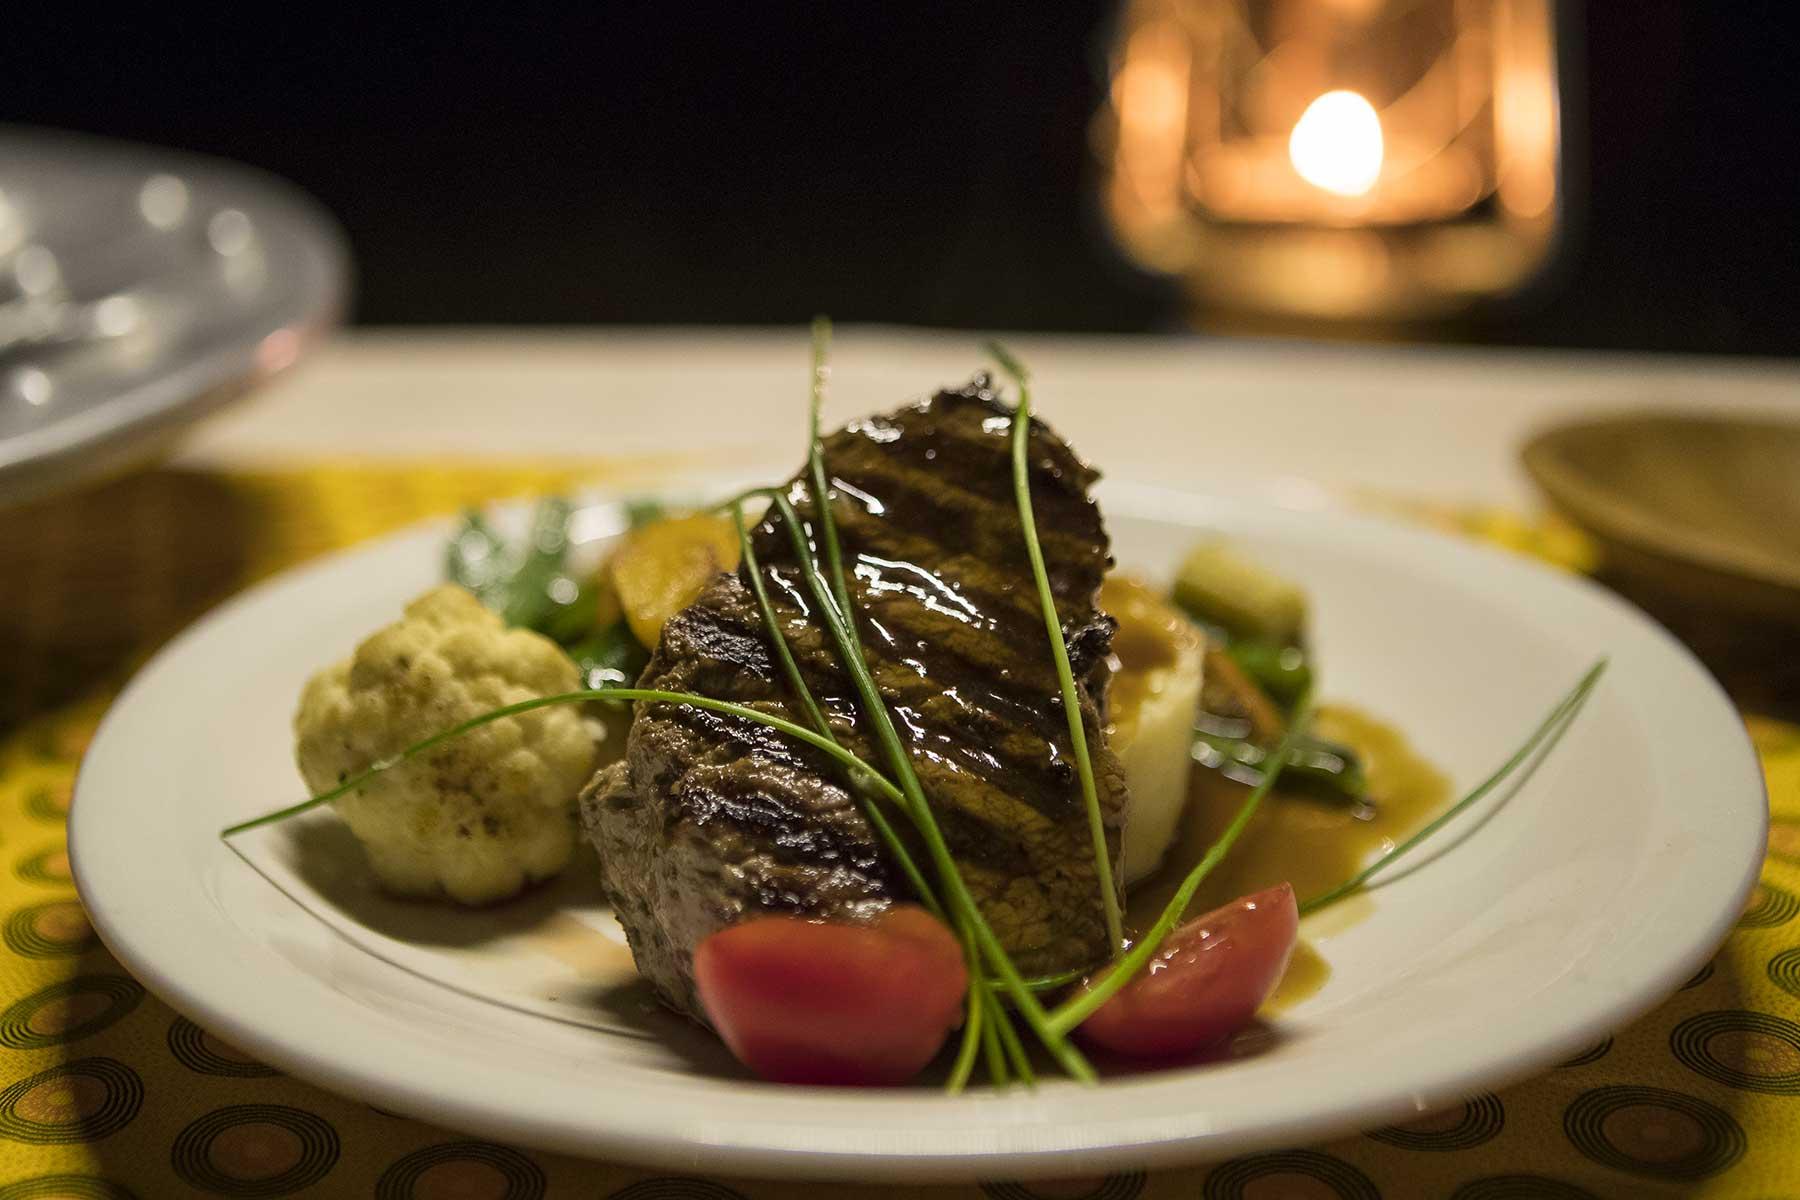 Dinner on Chase Africa Safaris